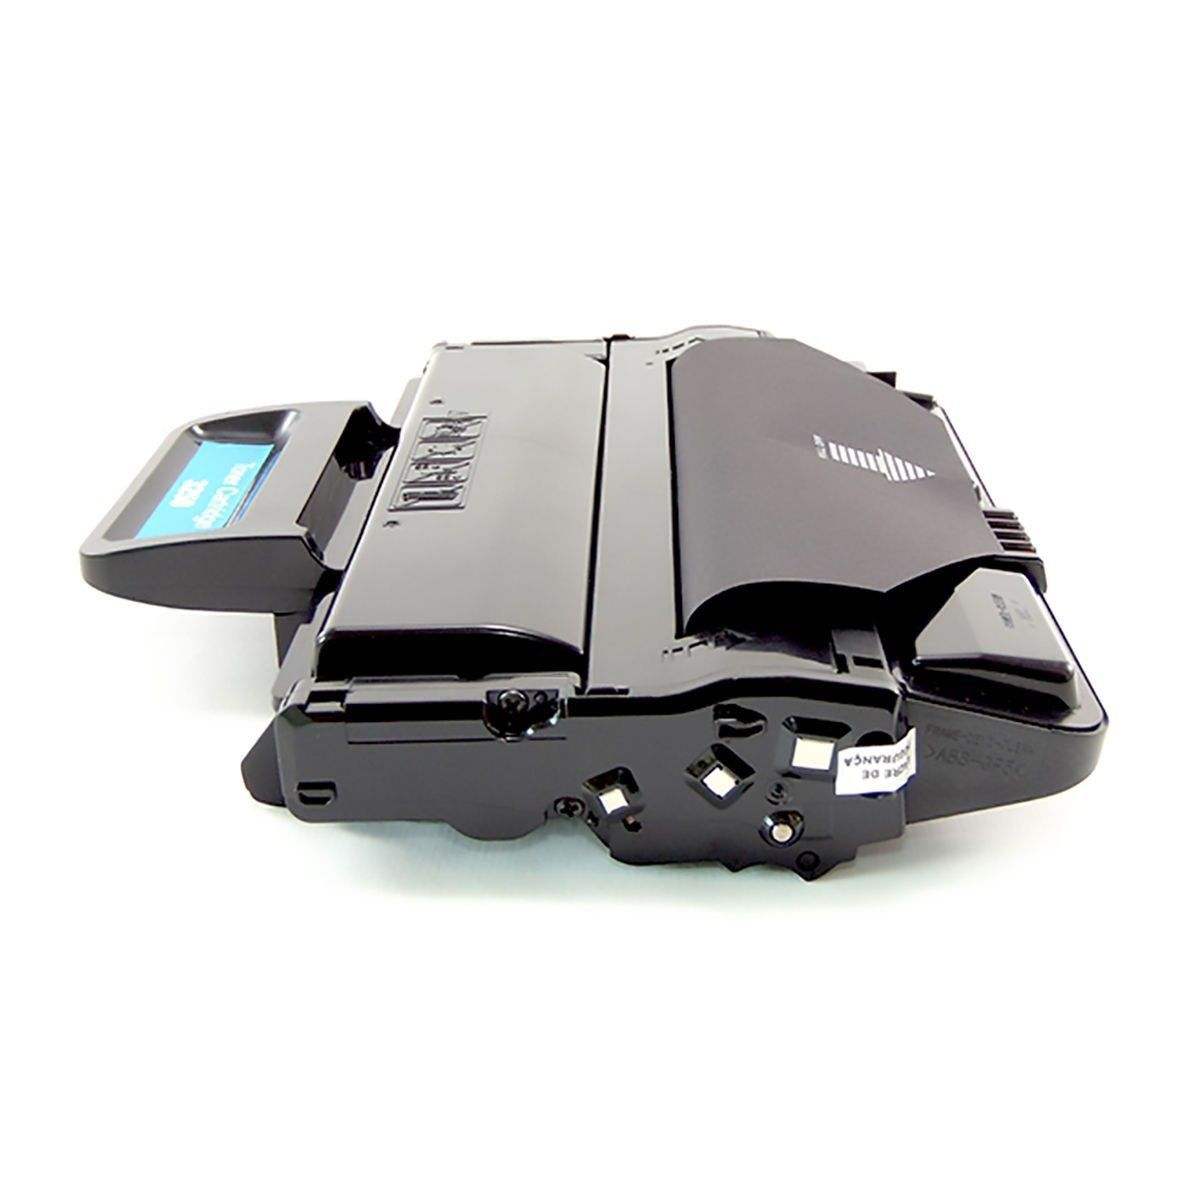 Compatível: Toner 106R01374 para Impressora Xerox Phaser 3250 3250d 3250dn / Preto / 5.000